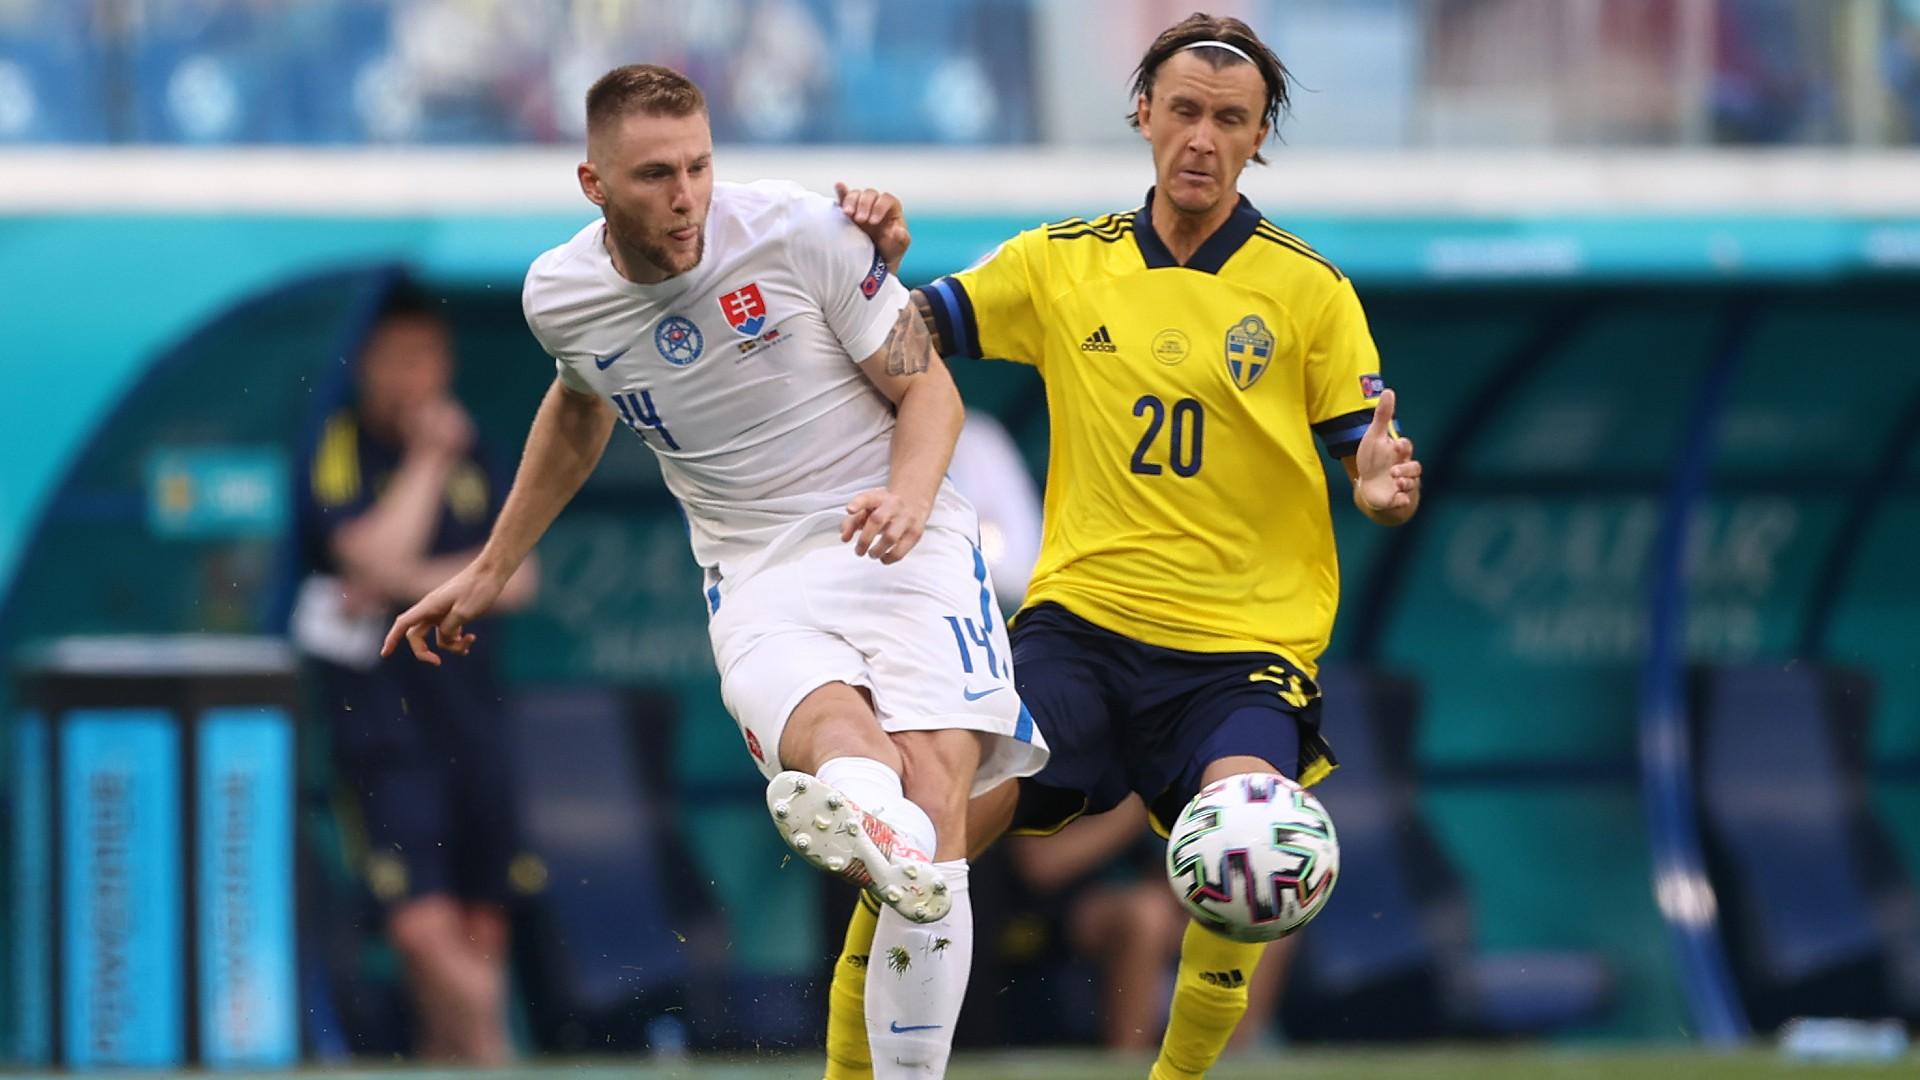 LIVE: Sweden vs Slovakia